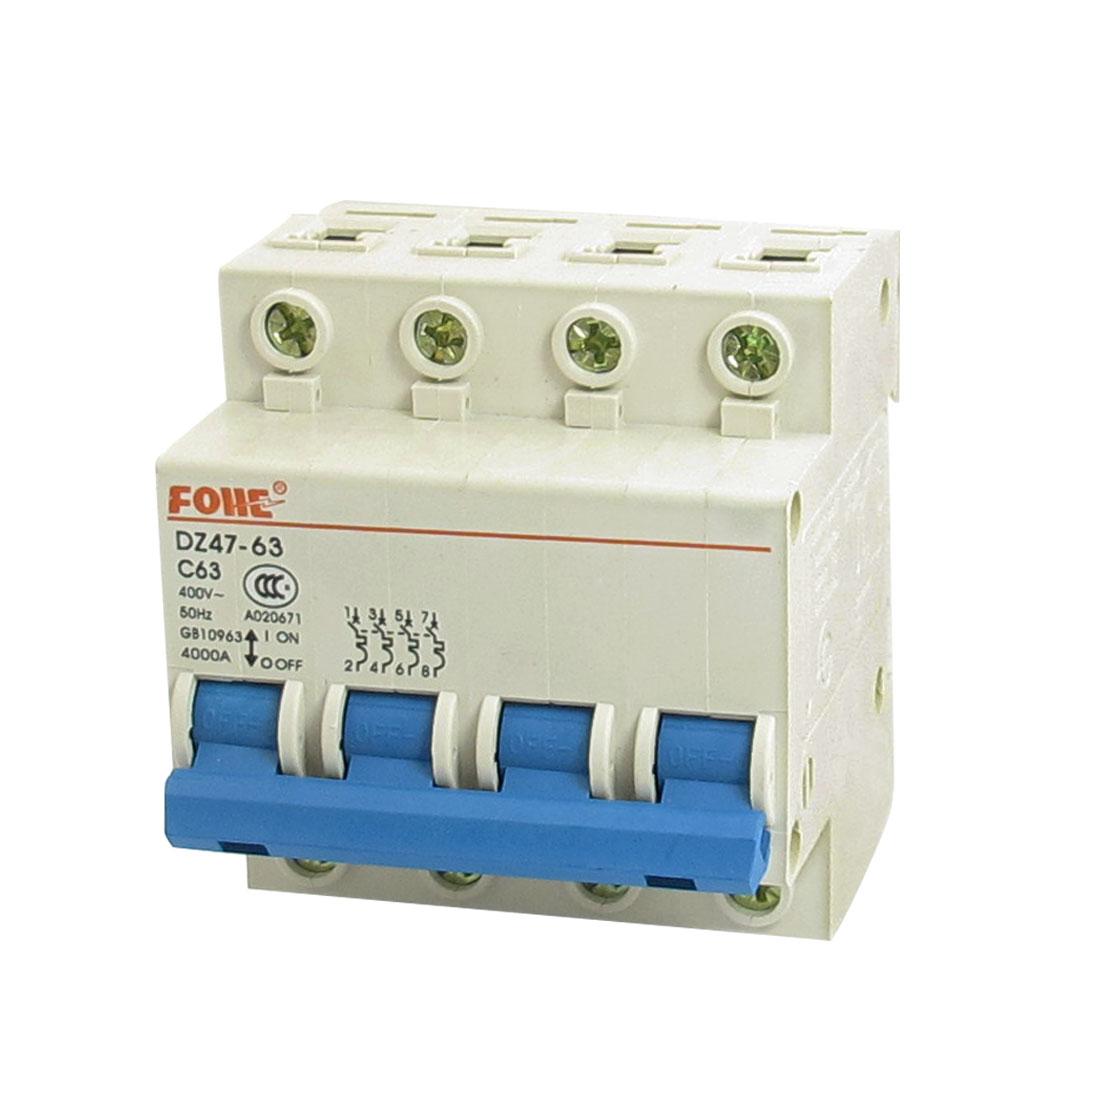 AC 400V 63A 4000A 4P 4 Pole Miniature Circuit Breaker DIN Rail DZ47-63 C63